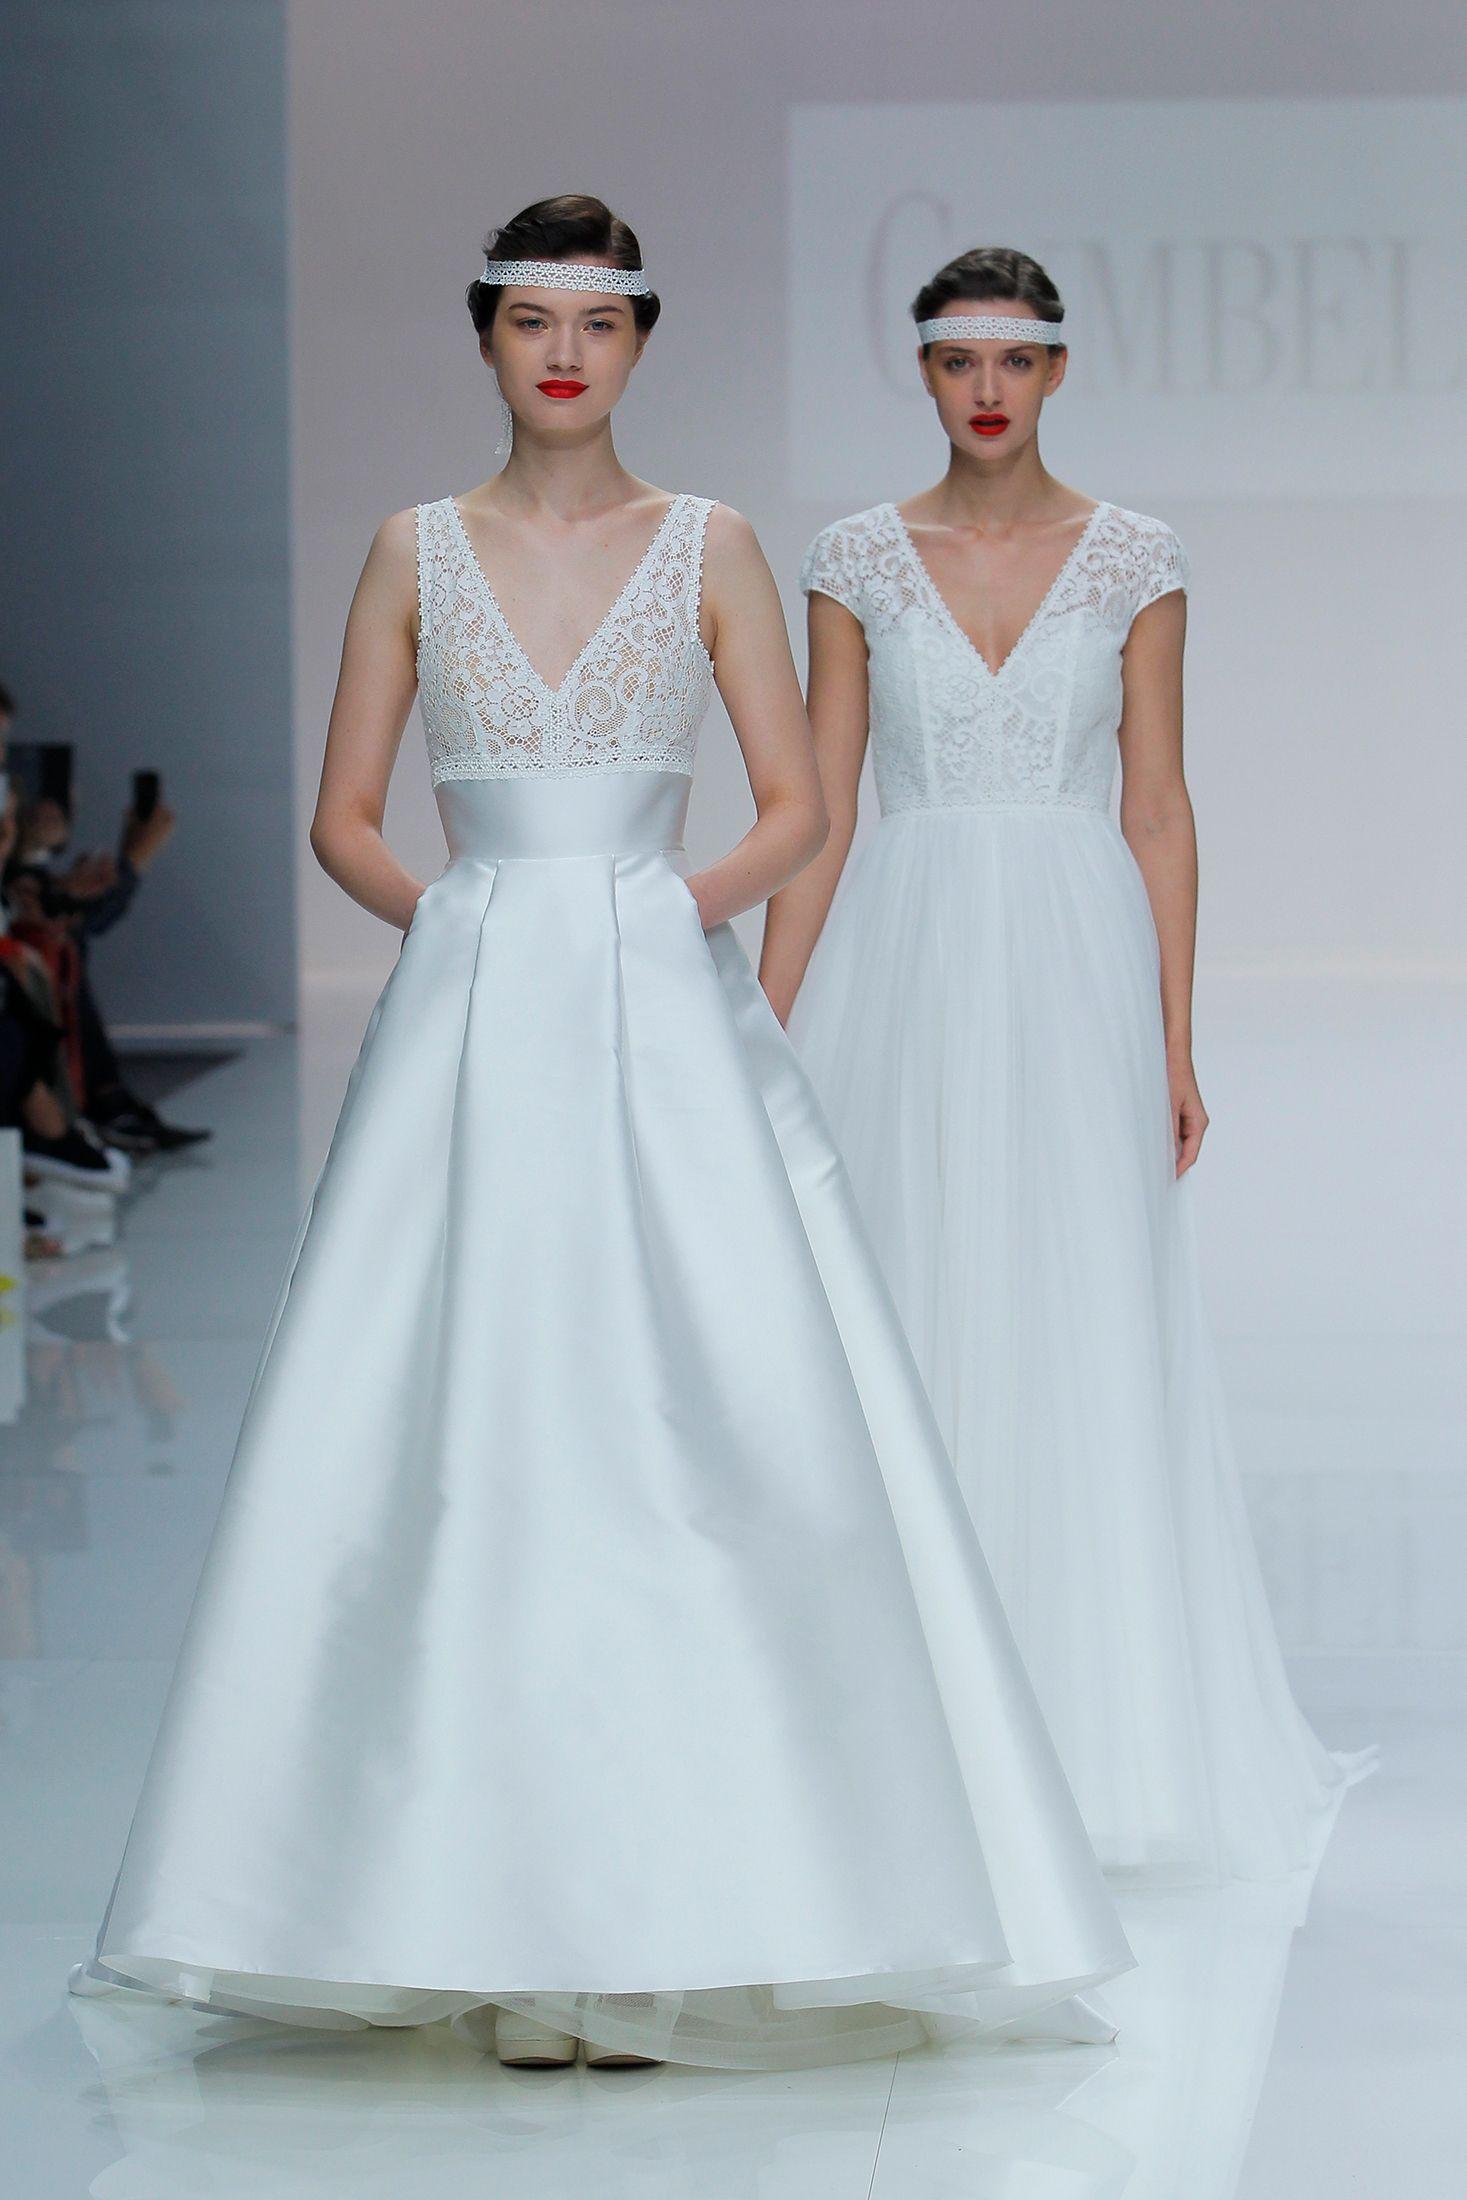 Vestido de Novia de Cymbeline - CY 057 #wedding #bodas #boda ...